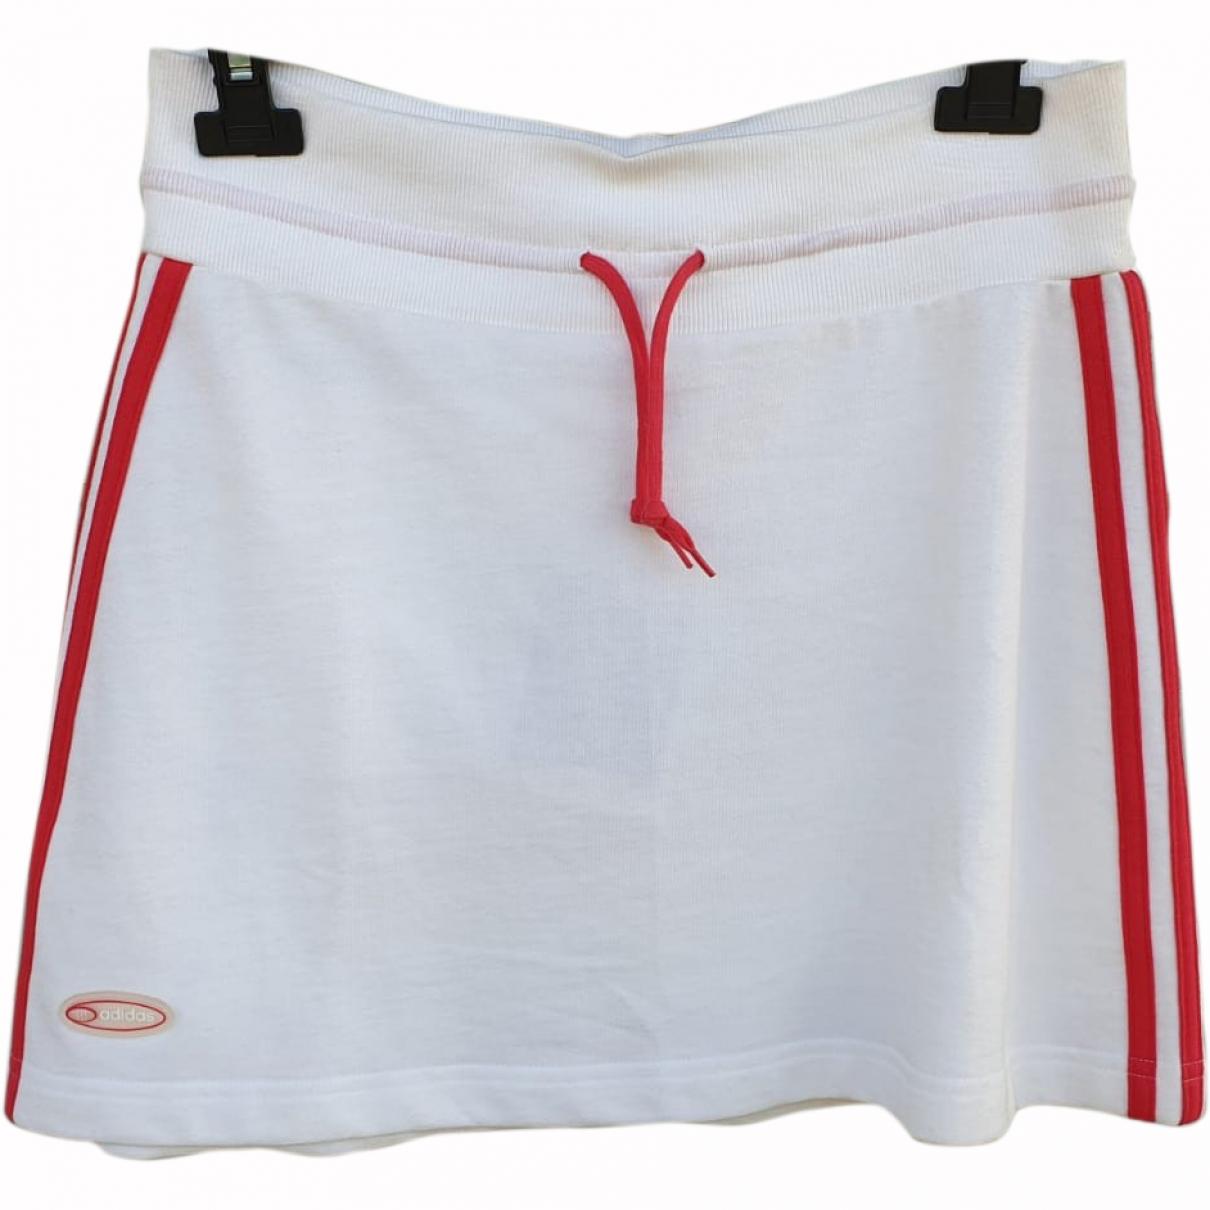 Adidas \N White Cotton skirt for Women M International